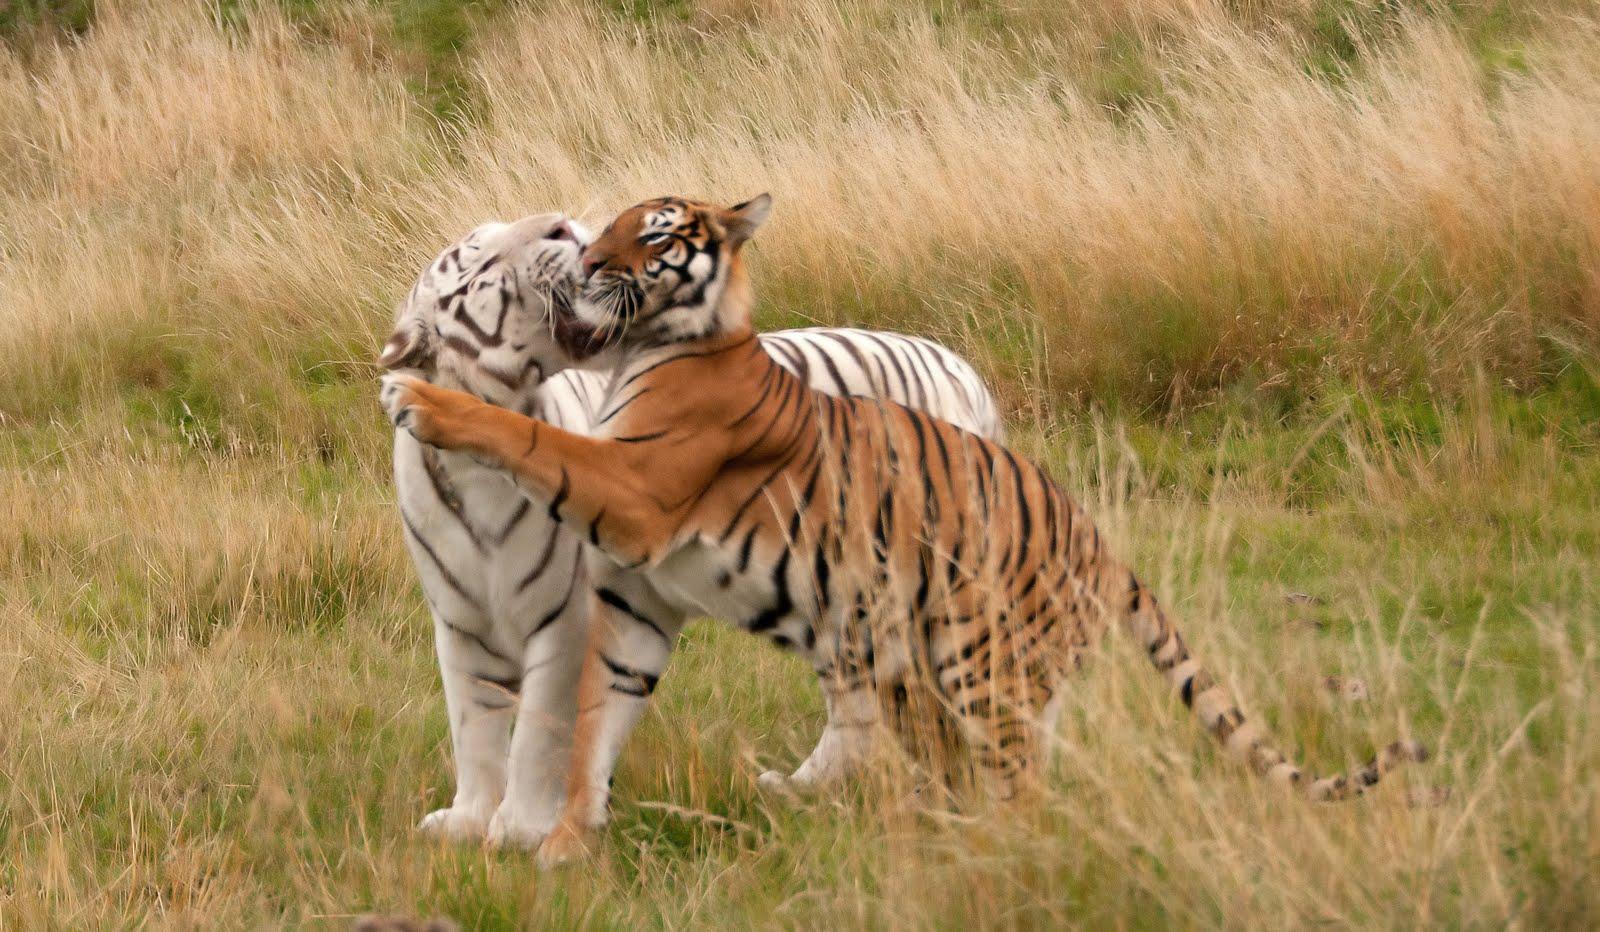 Anthony Miners Wildlife Photos: Bengal Tigers